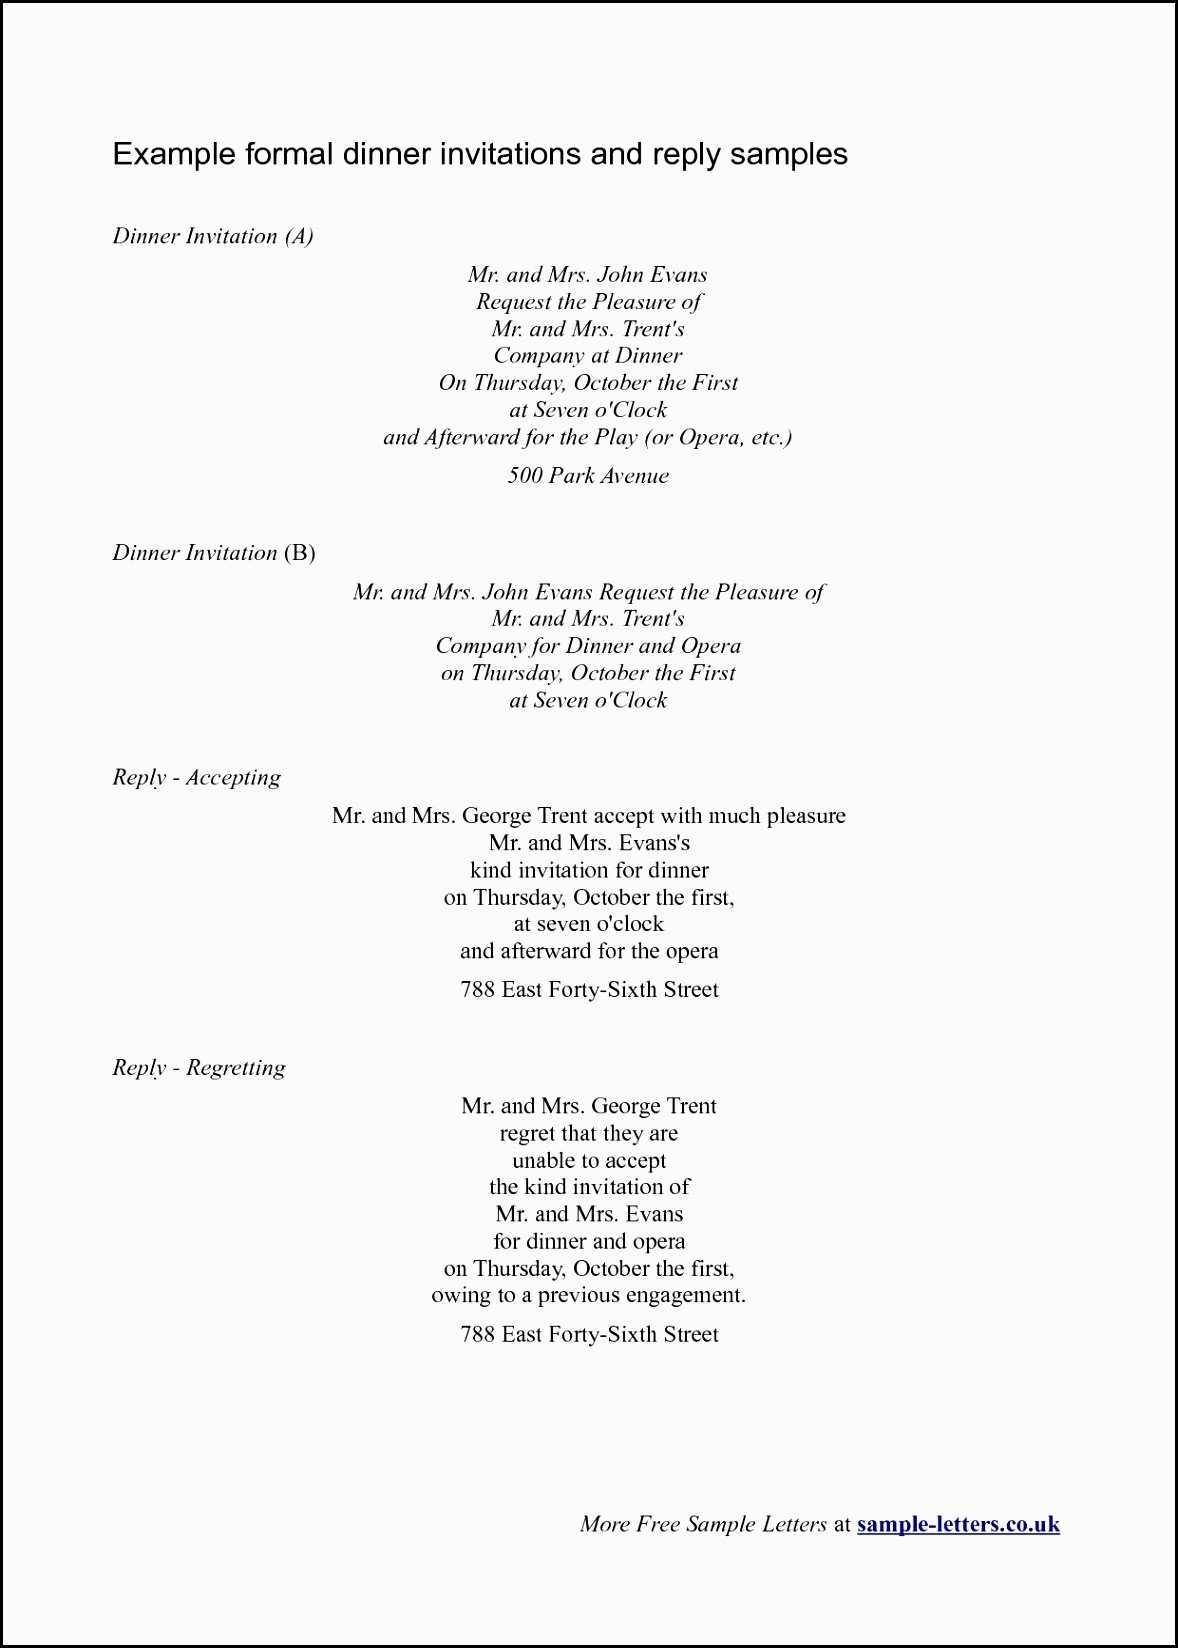 76 Customize Dinner Invitation Response Sample Maker by Dinner Invitation Response Sample